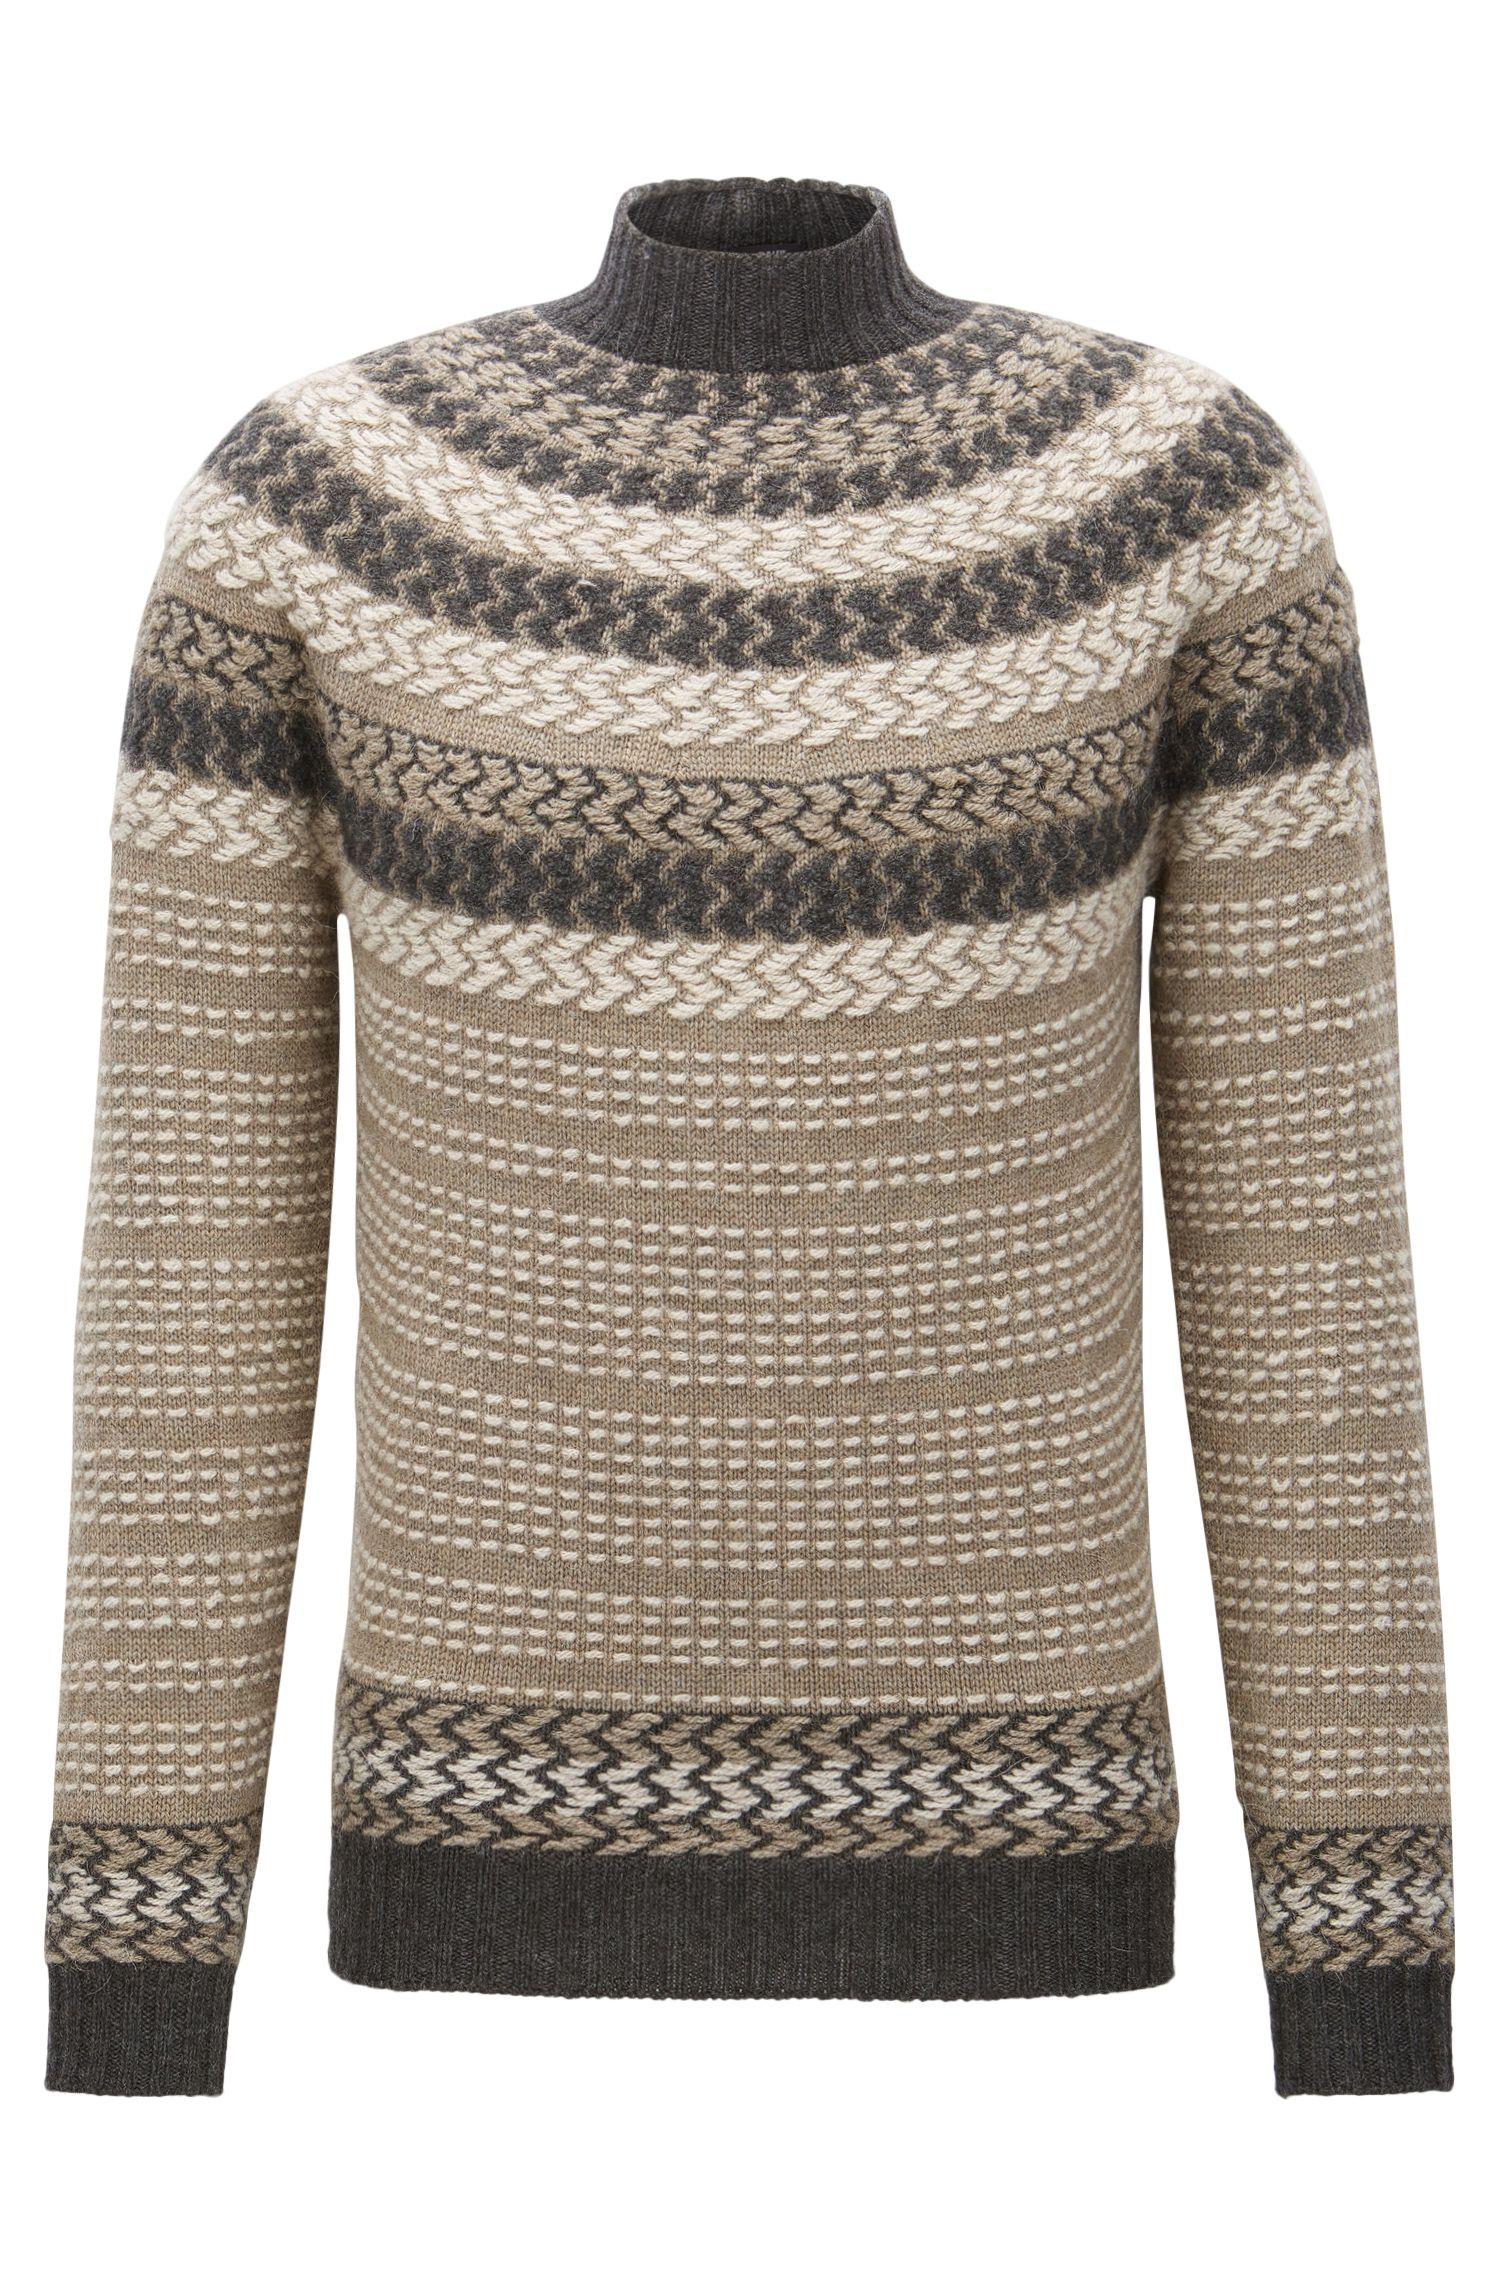 Virgin Wool-Alpaca Turtleneck Sweater | Nateus, Khaki